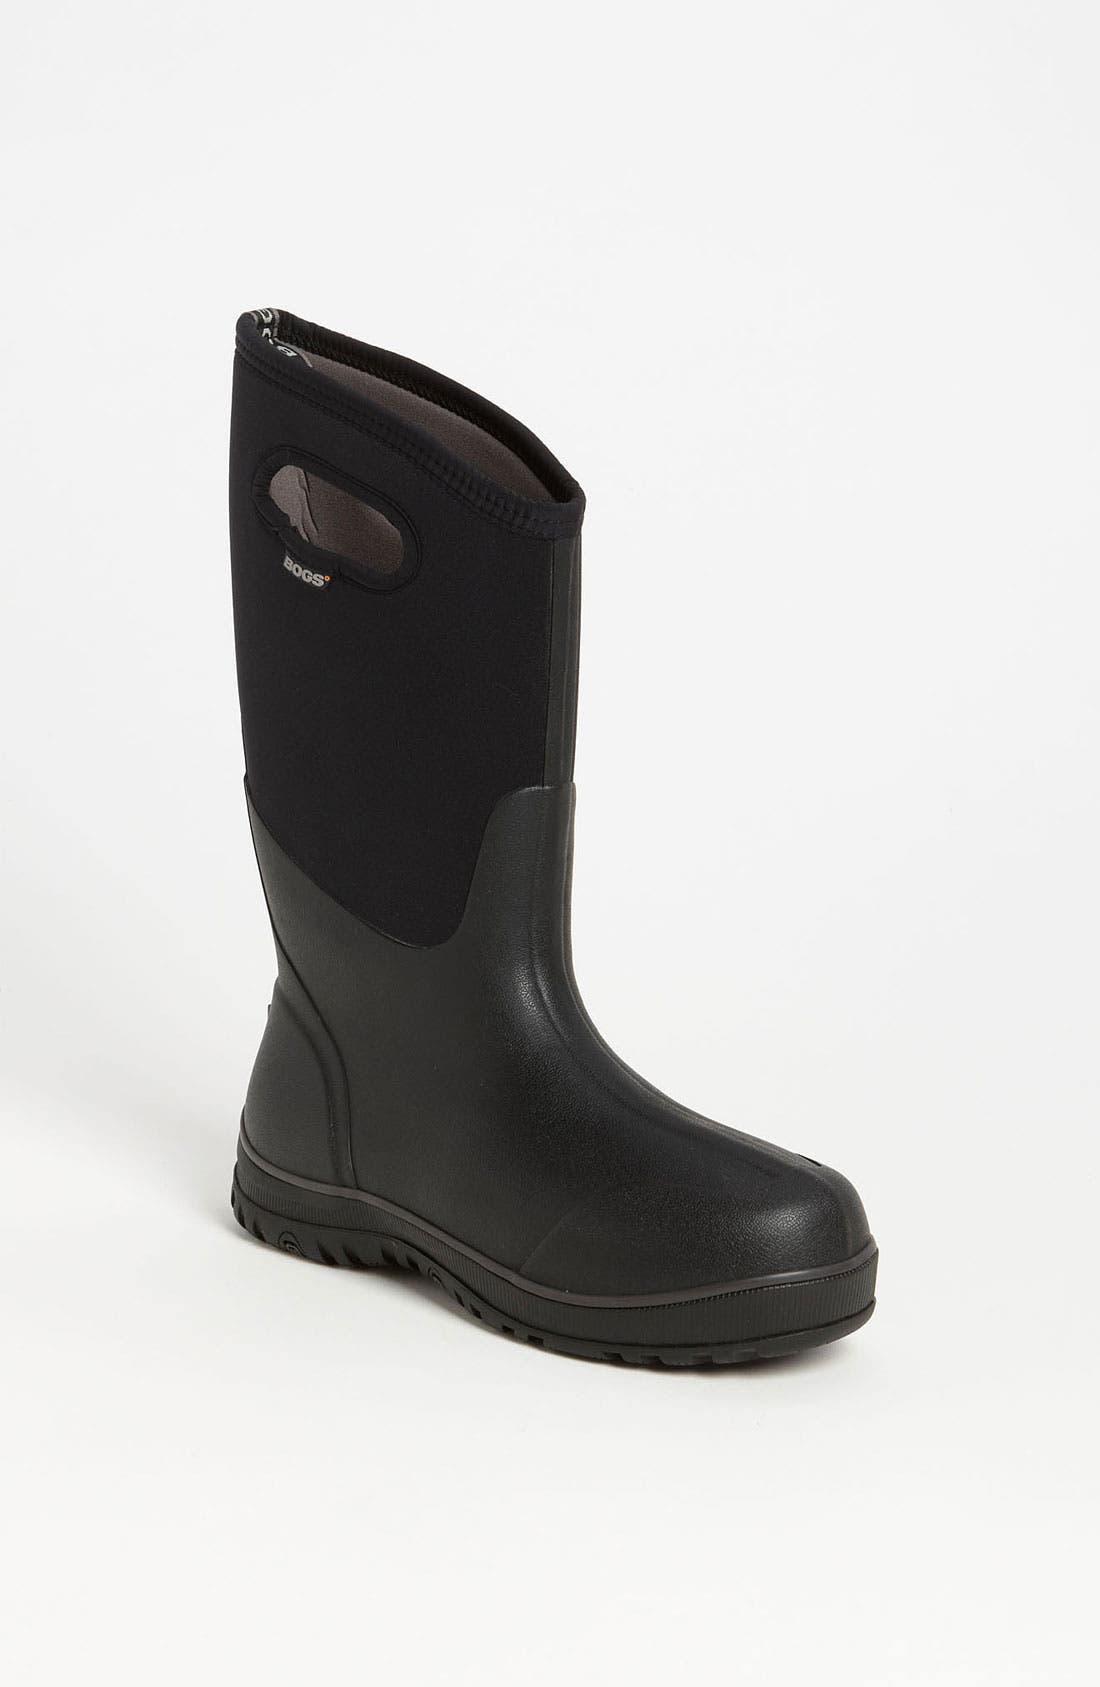 Main Image - Bogs 'Ultra High' Rain Boot   (Online Only) (Men)